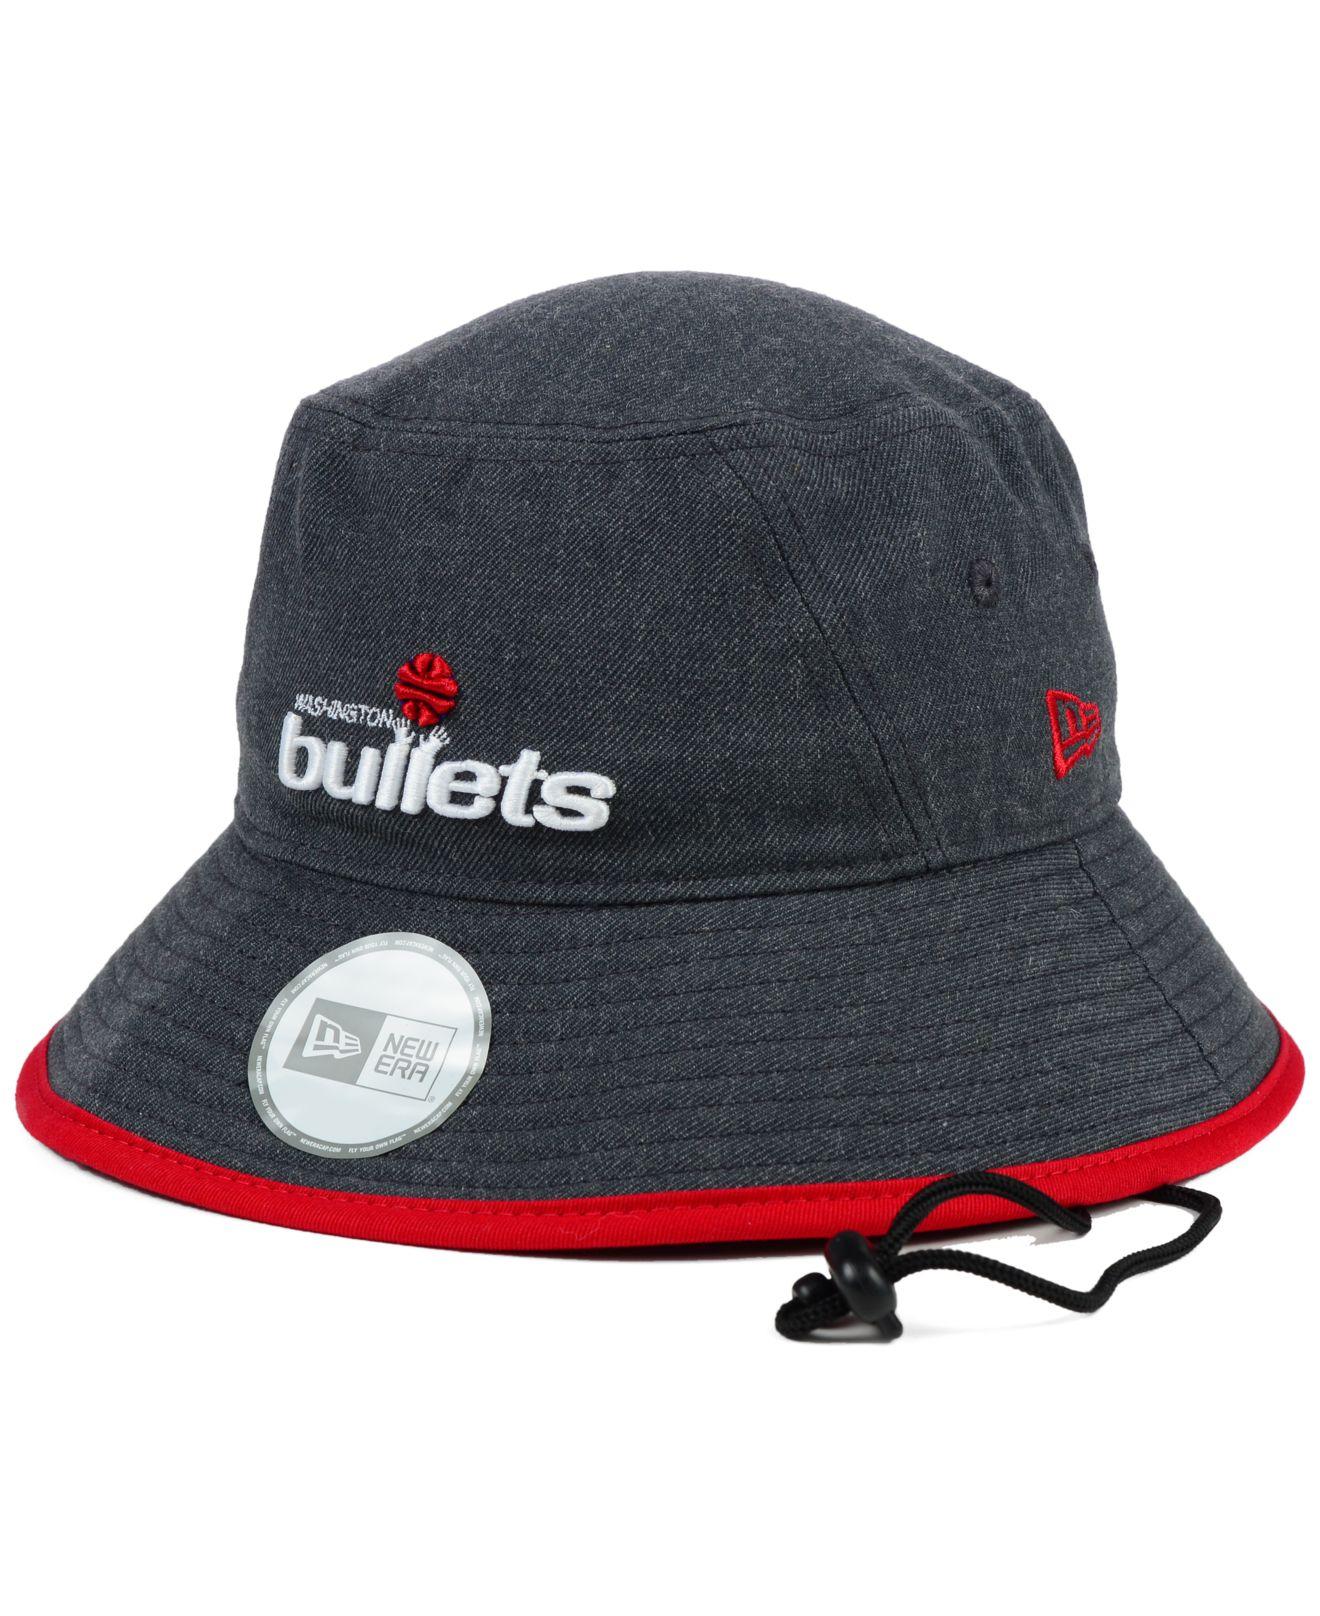 ... order lyst ktz washington bullets dark heather tipped bucket hat in  gray for men 907ac 8d31c e0752e5547fe